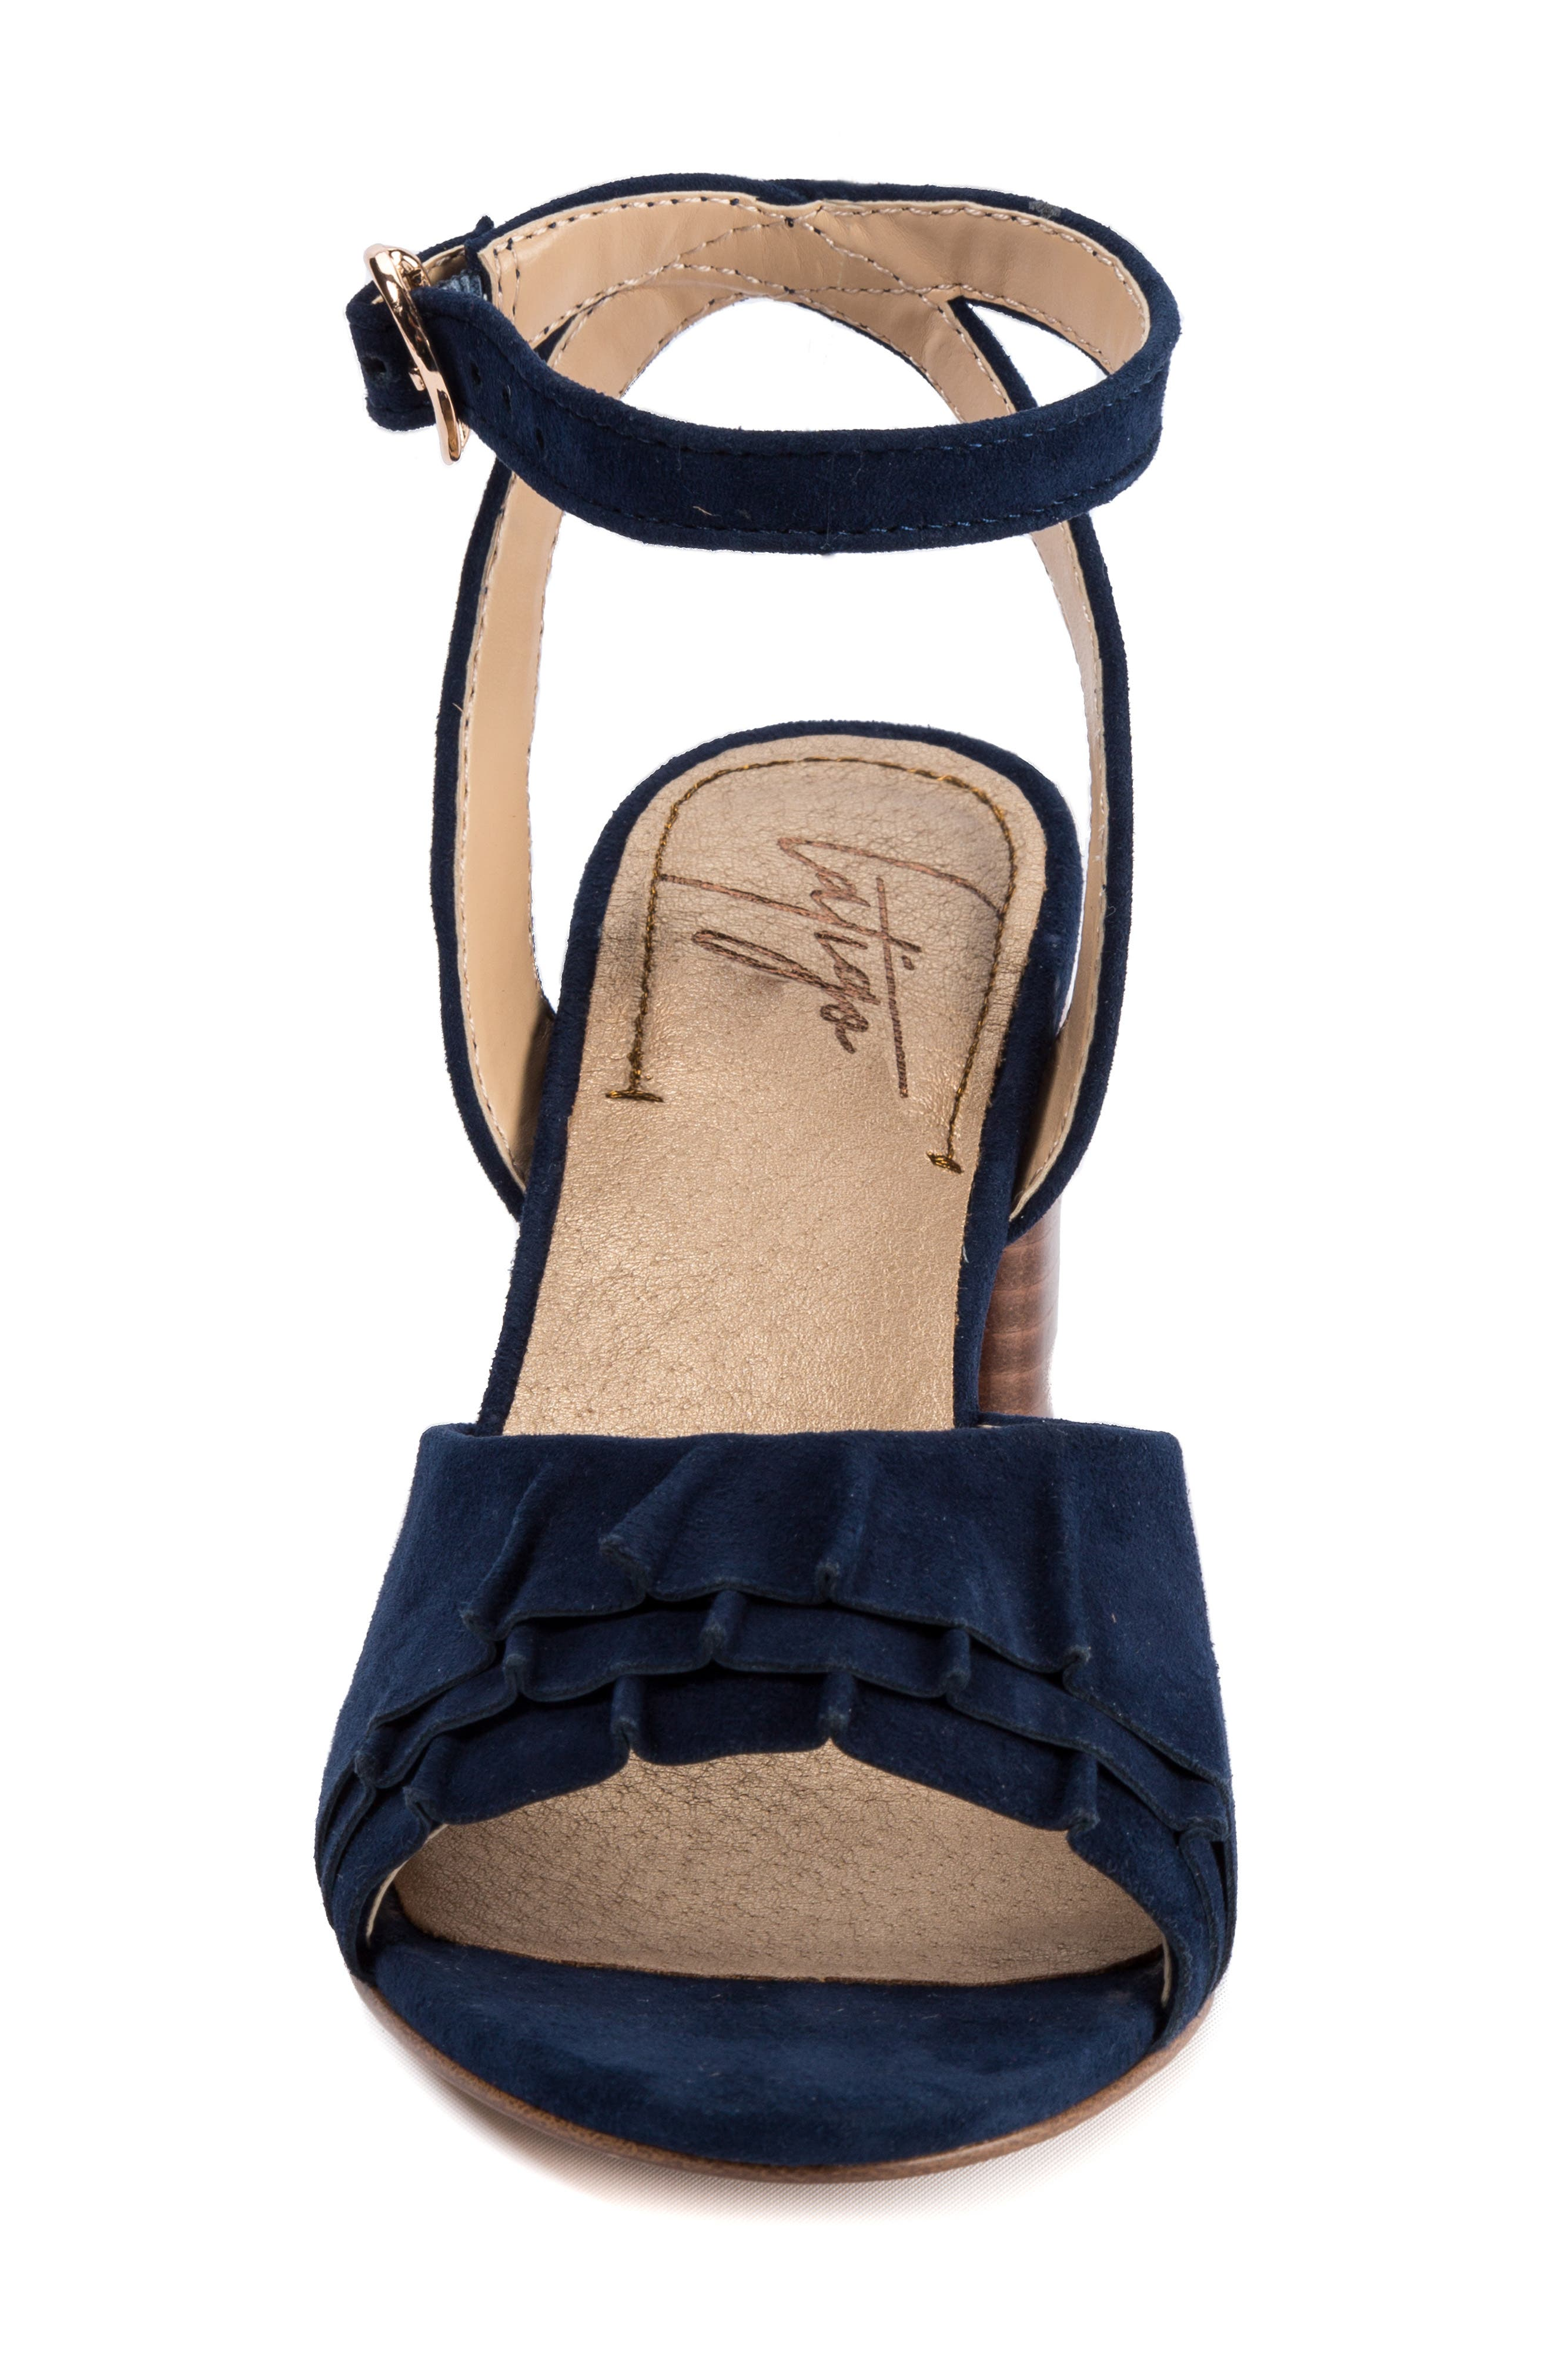 LATIGO, Idelle Ankle Strap Sandal, Alternate thumbnail 4, color, 410